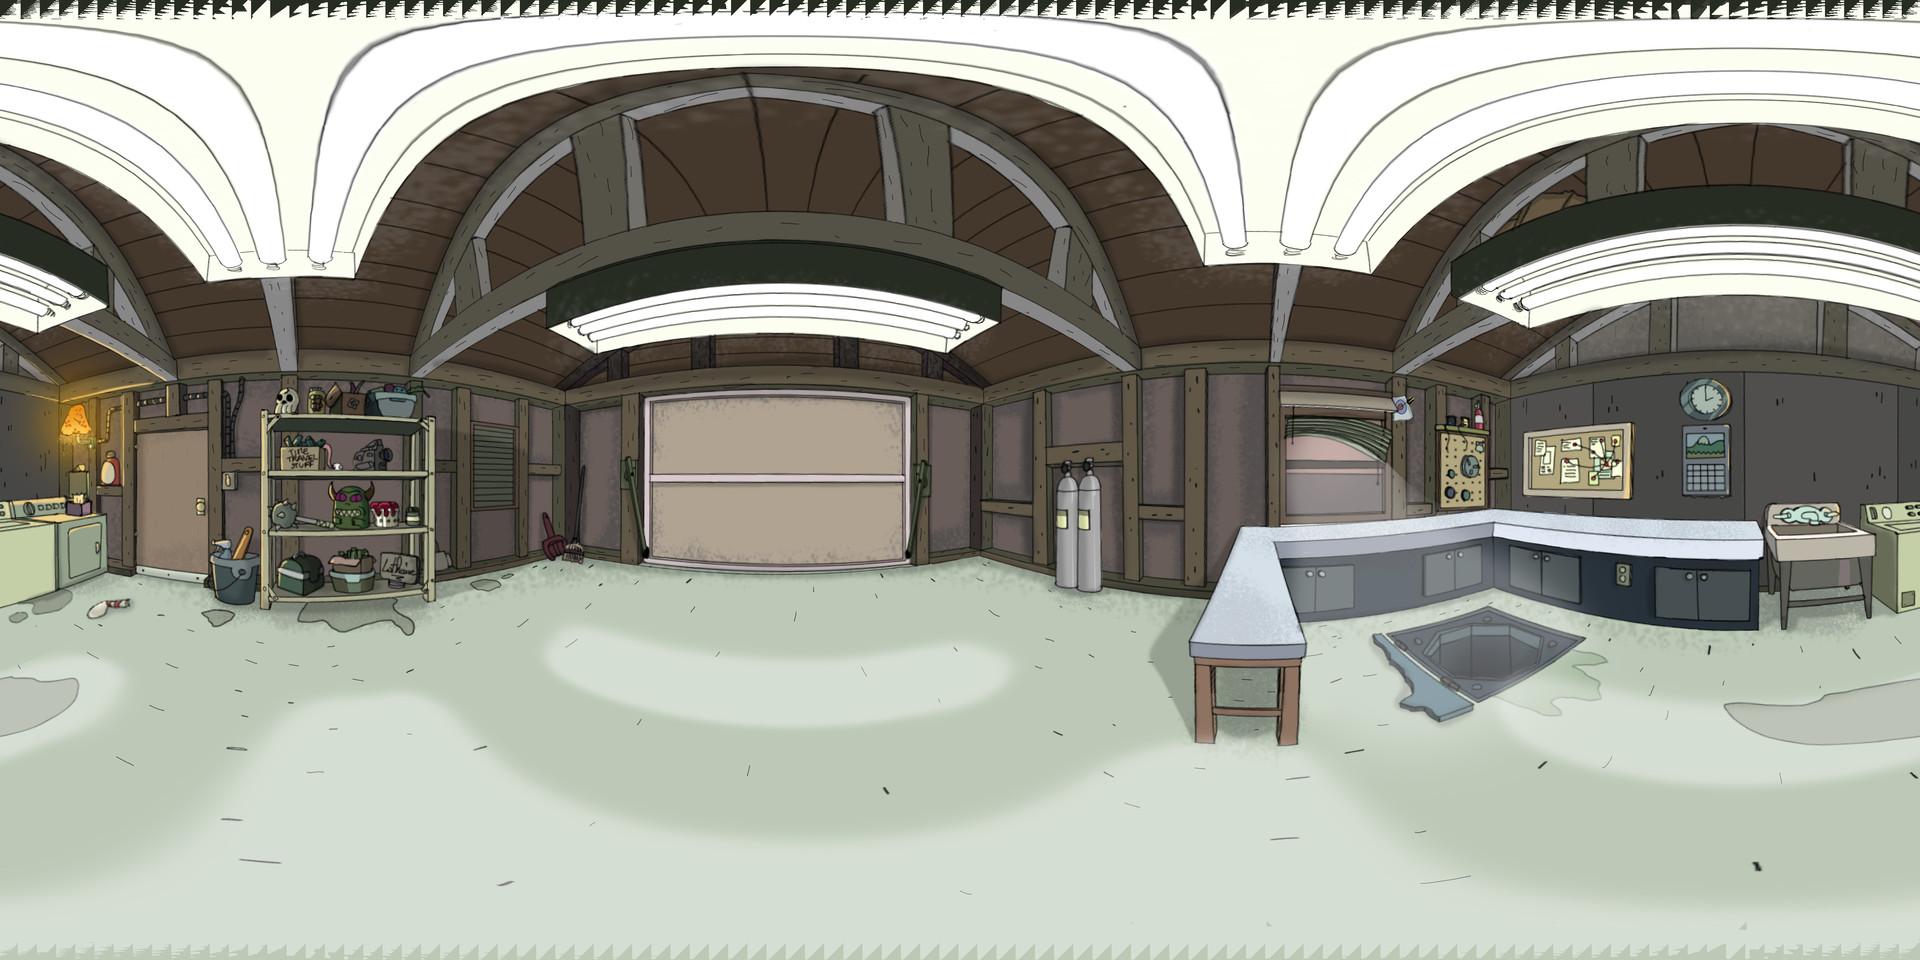 ArtStation - Rick & Morty - Garage 360/VR, Lothaire Limon on